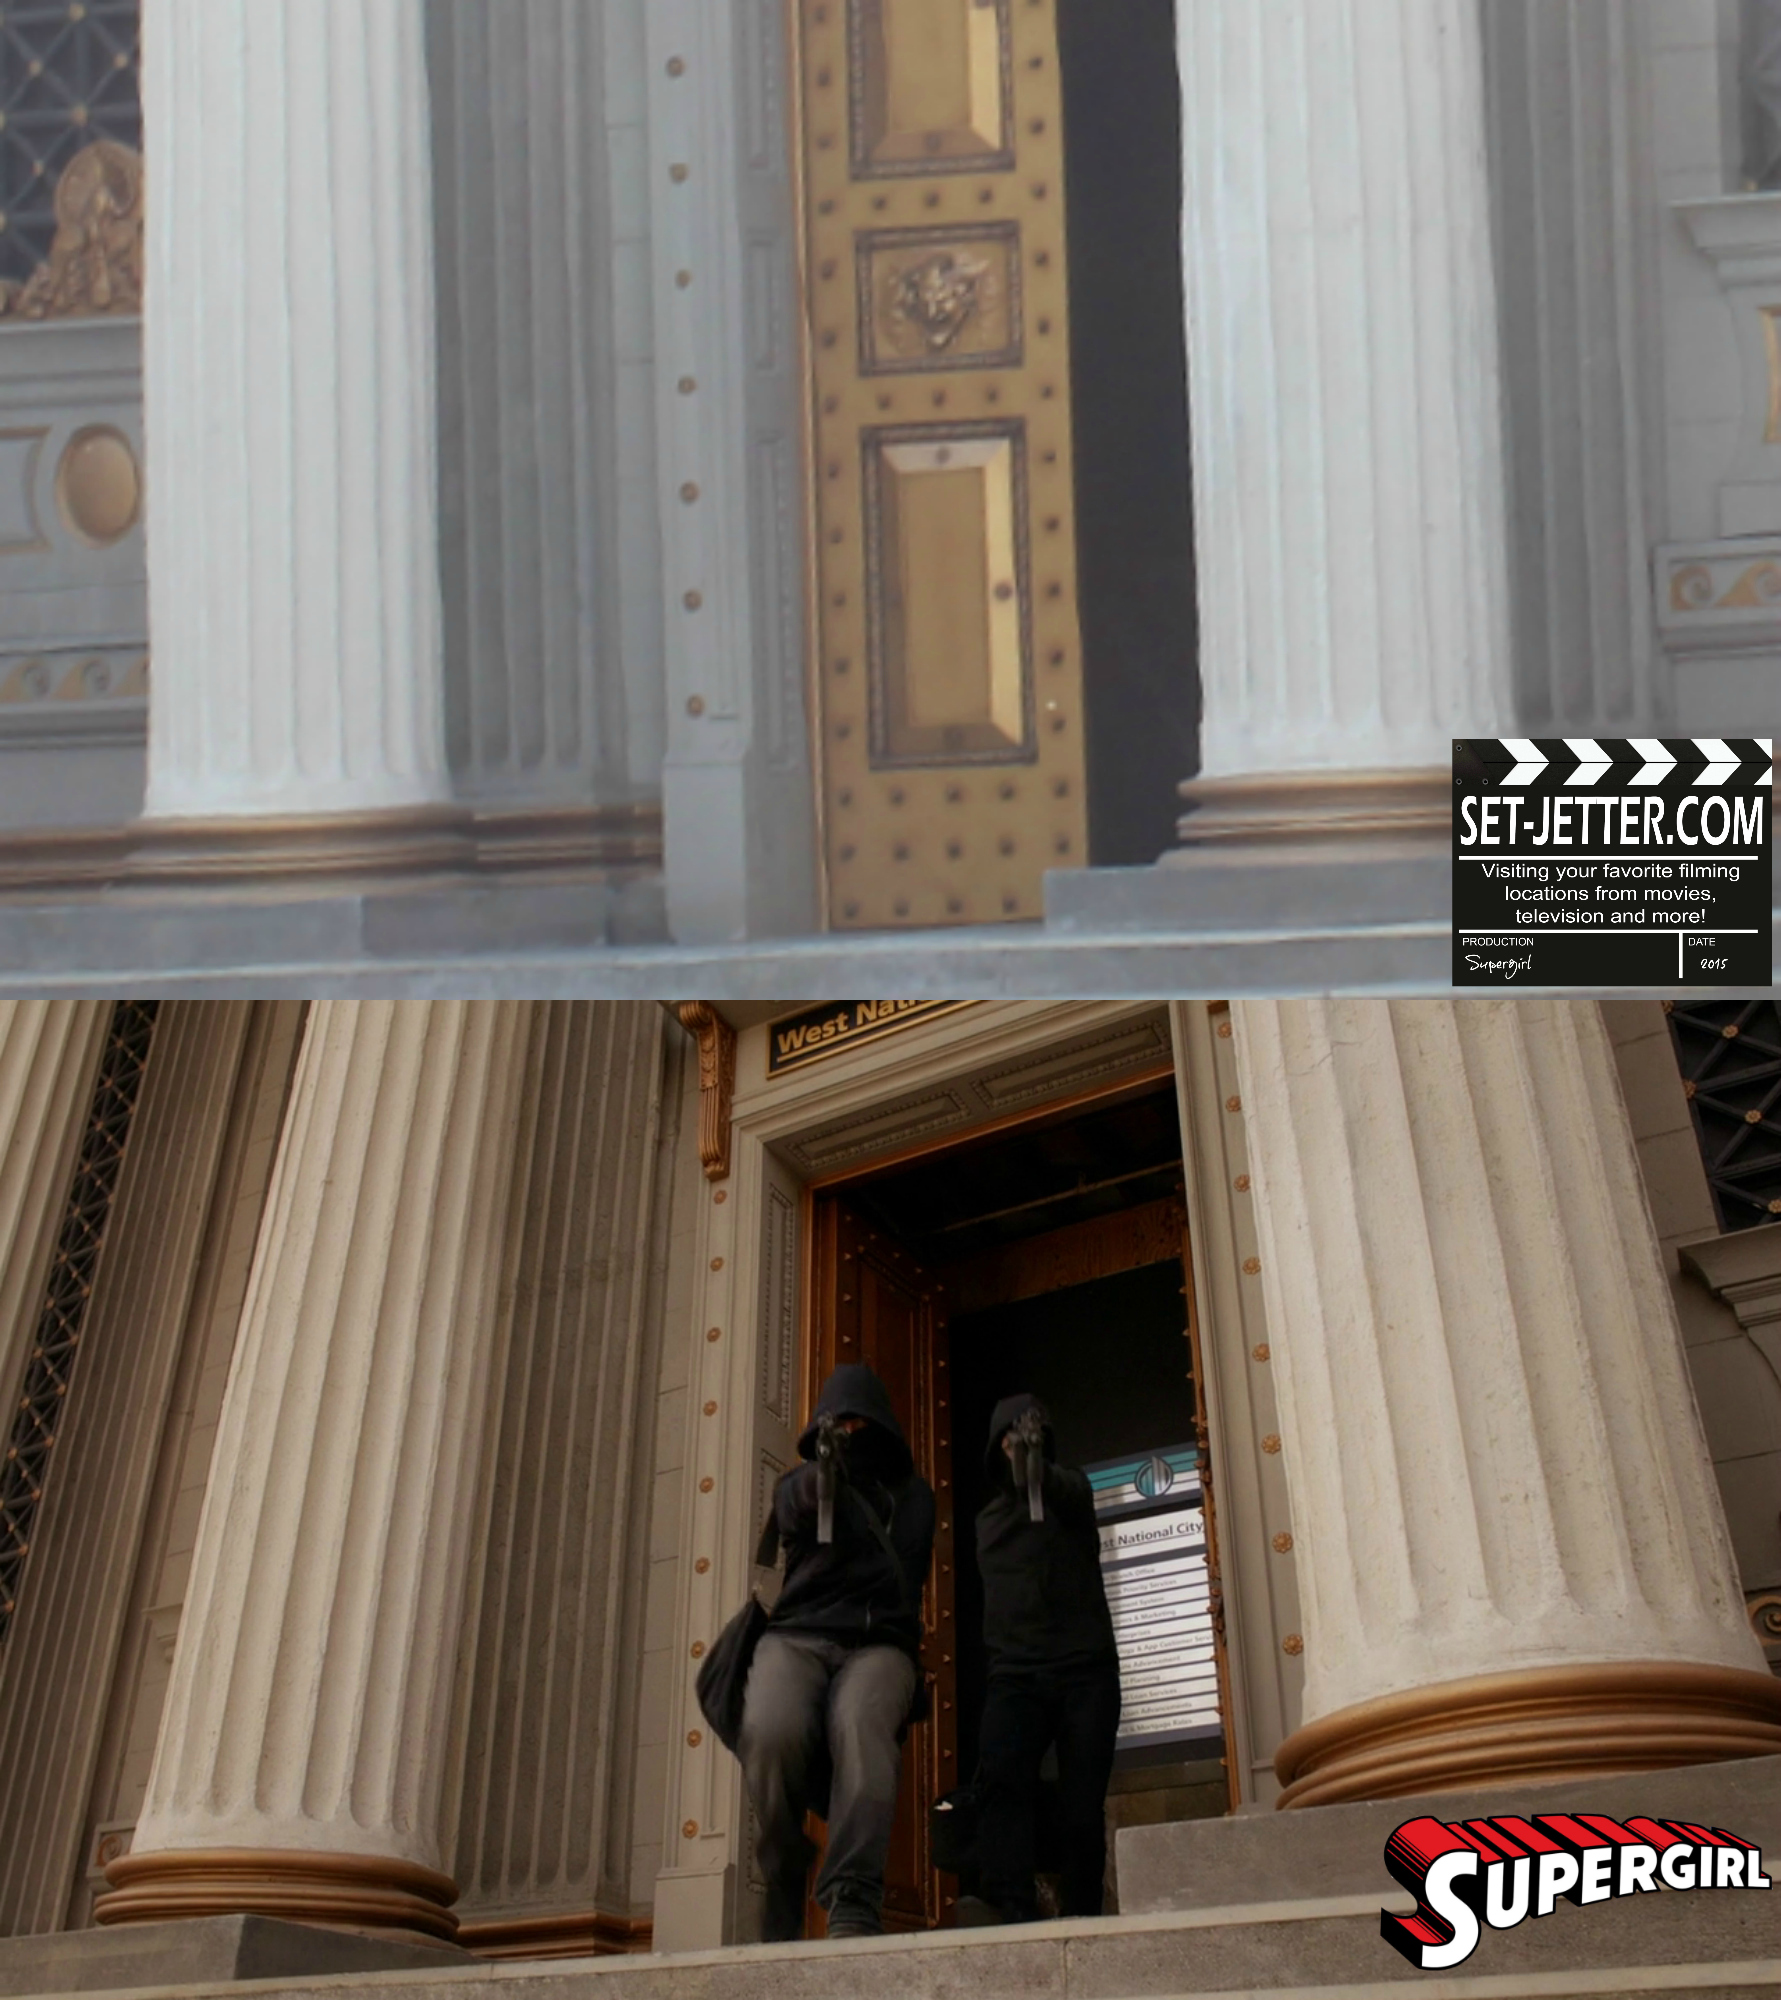 Supergirl comparison 20.jpg